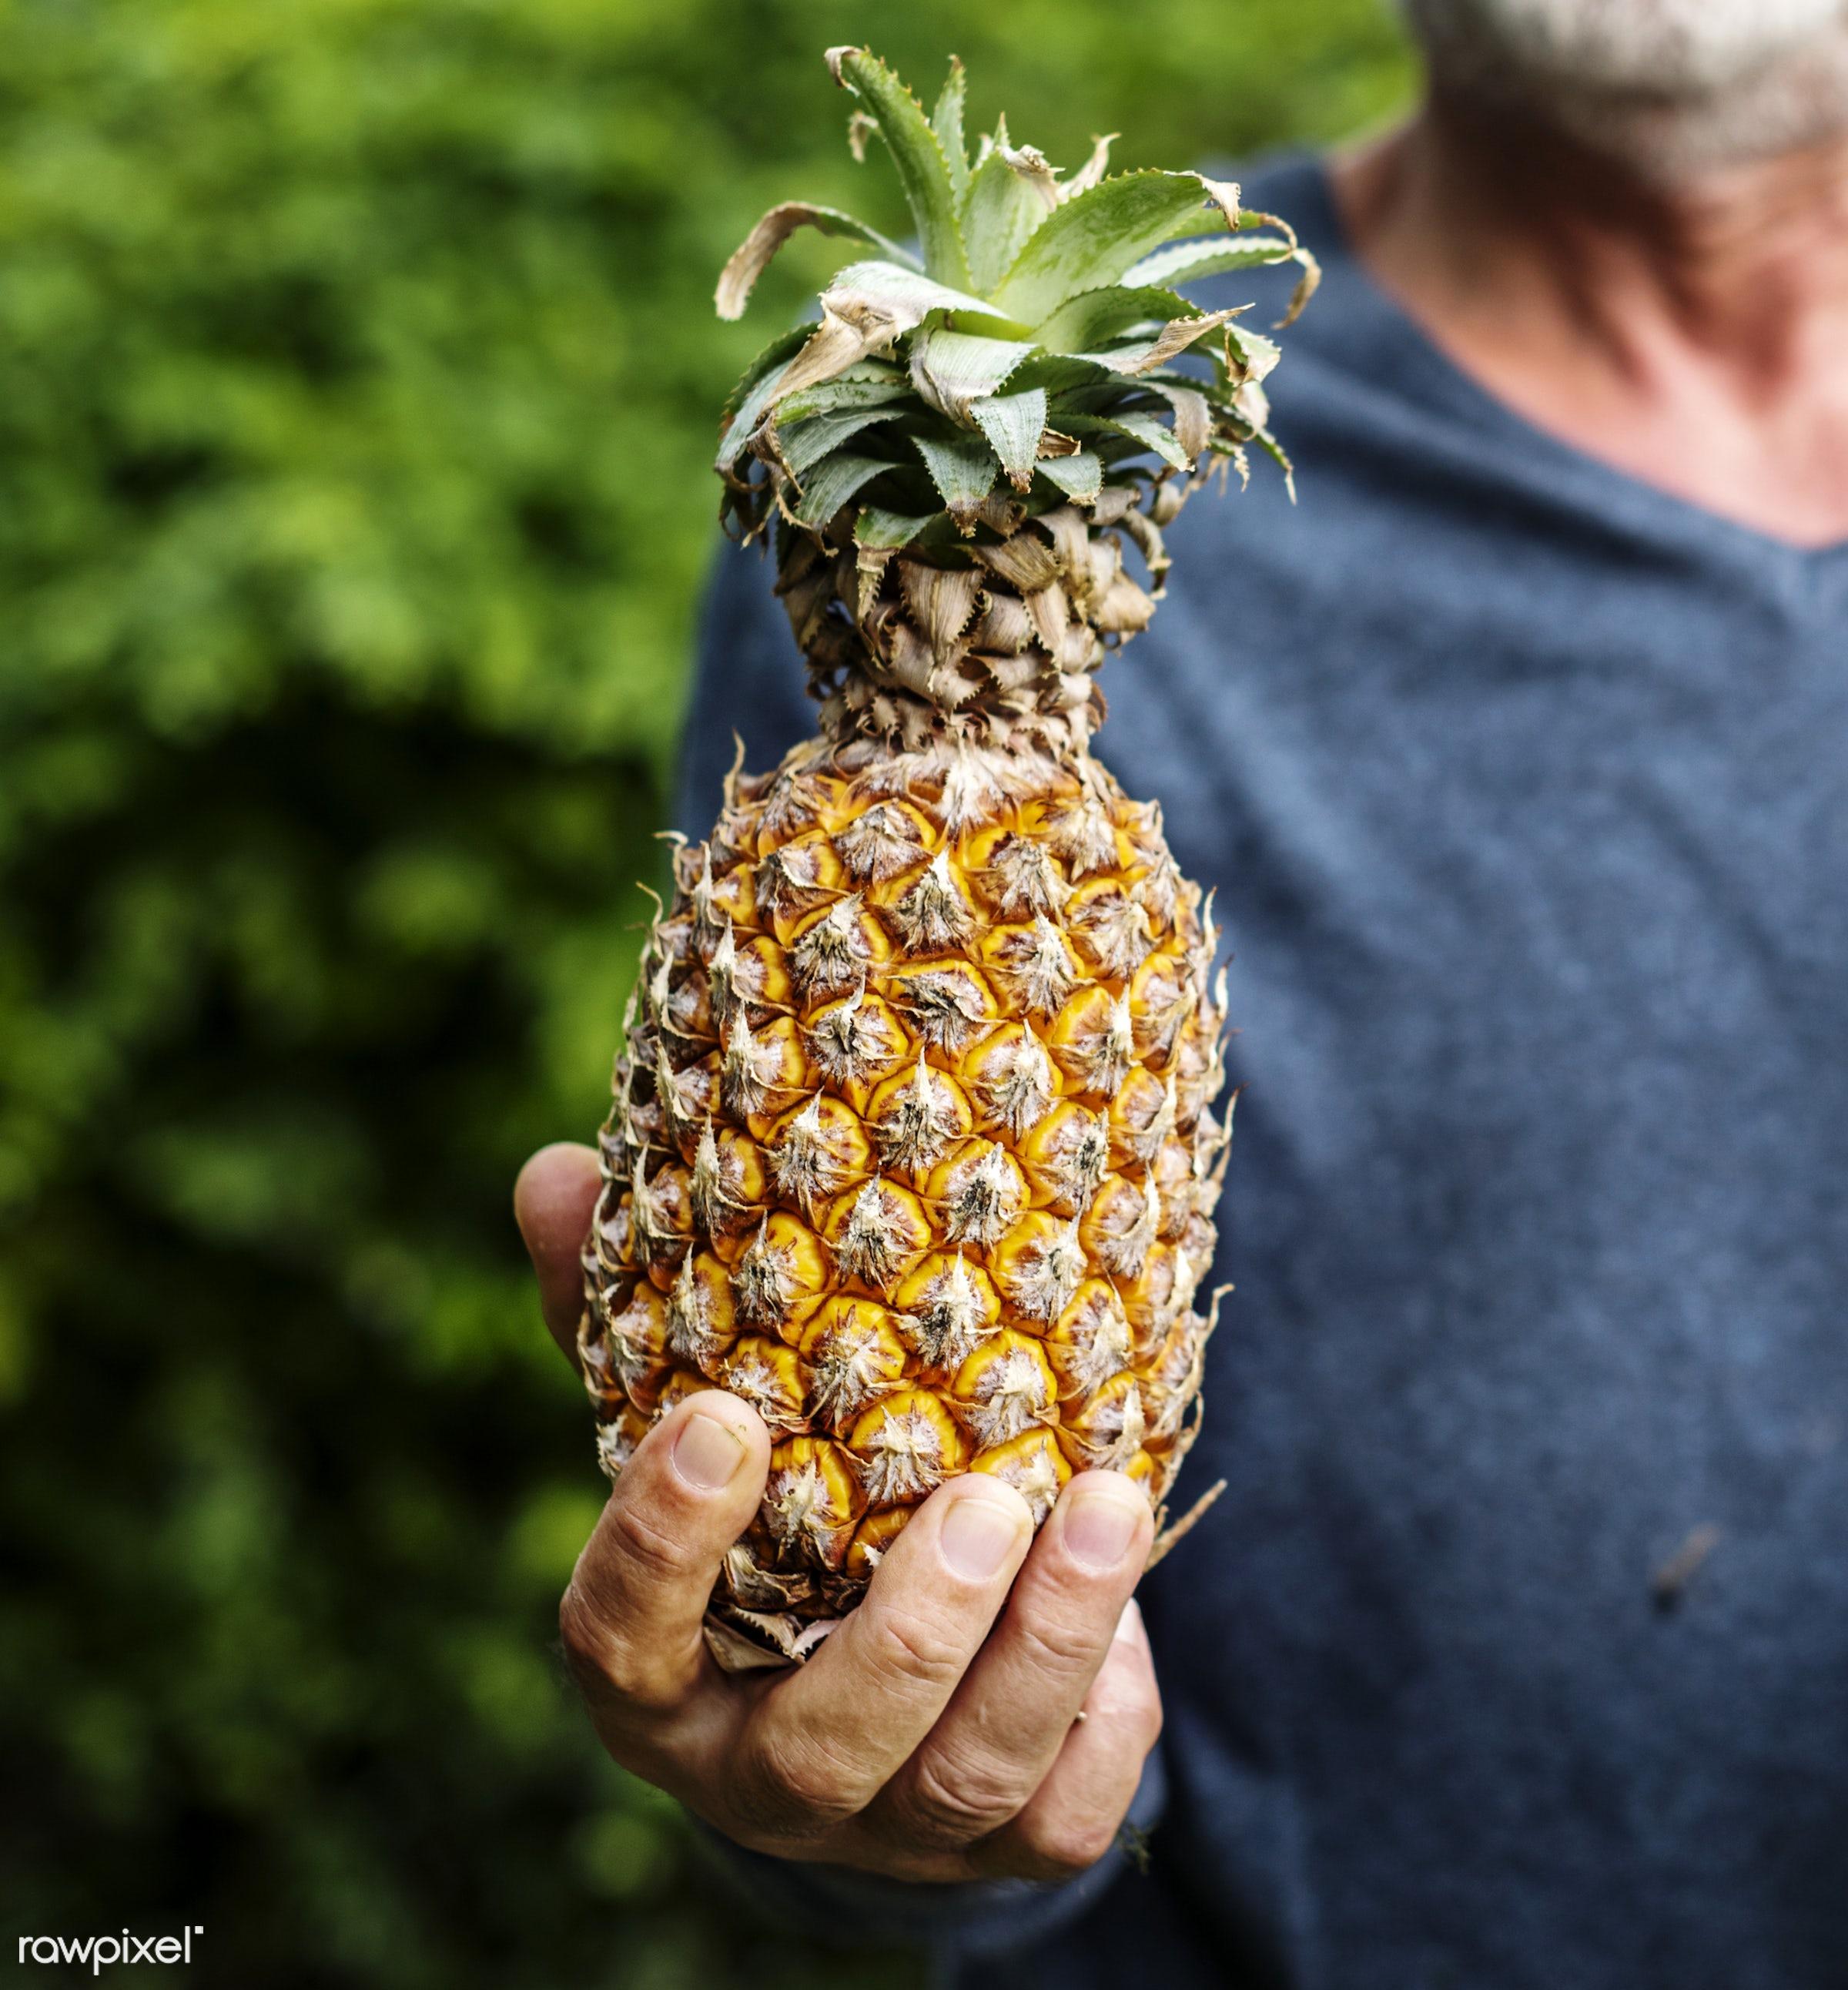 raw, holding, farm, nature, hands, fresh, closeup, fruit, organic, healthy, harvest, pineapple, produce